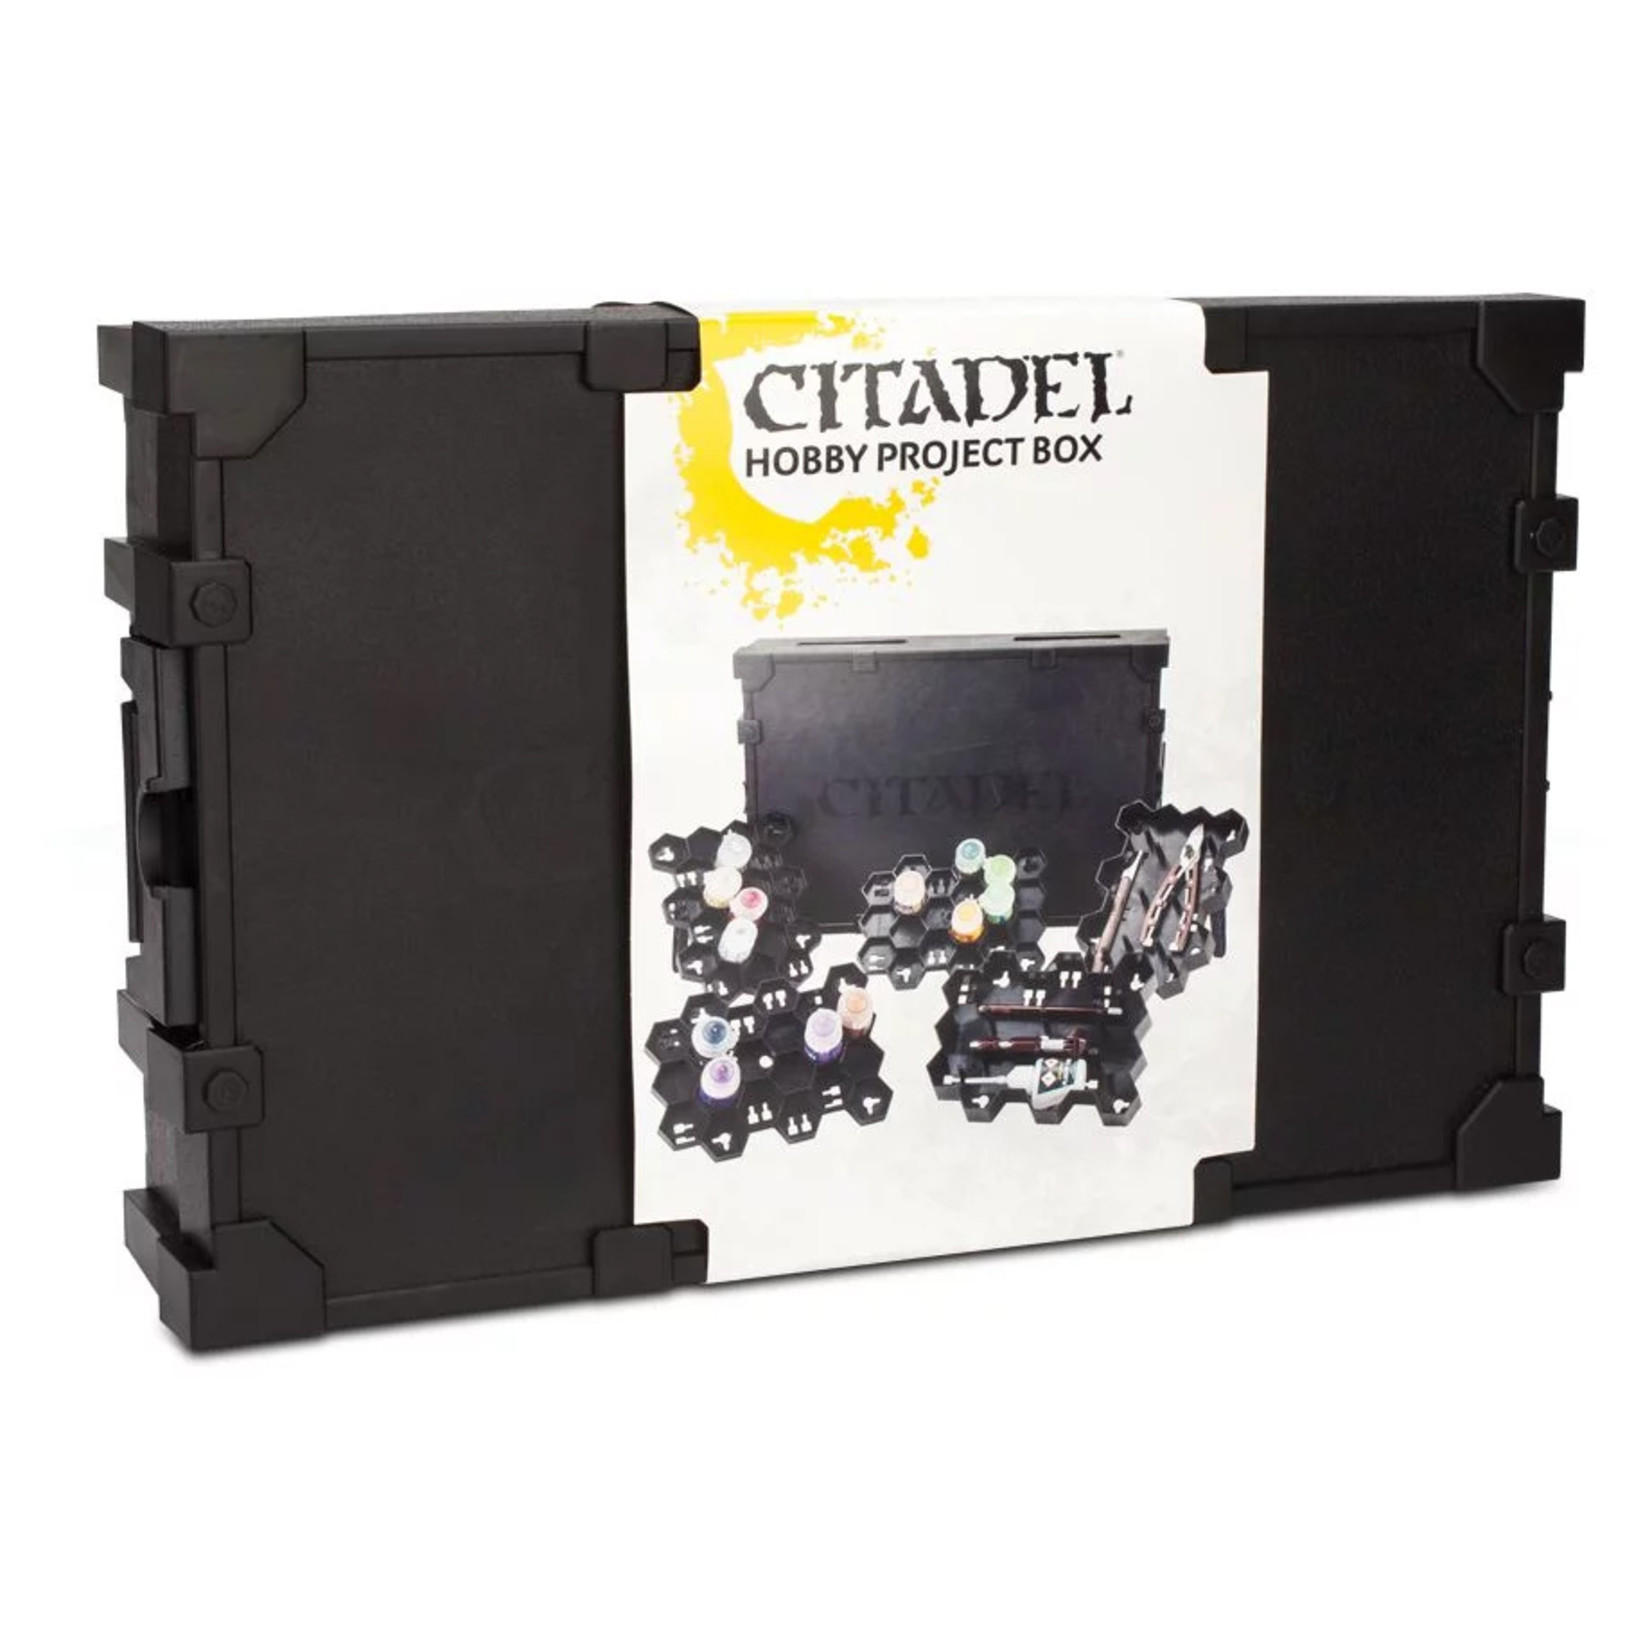 Games Workshop Citadel Hobby Project Box